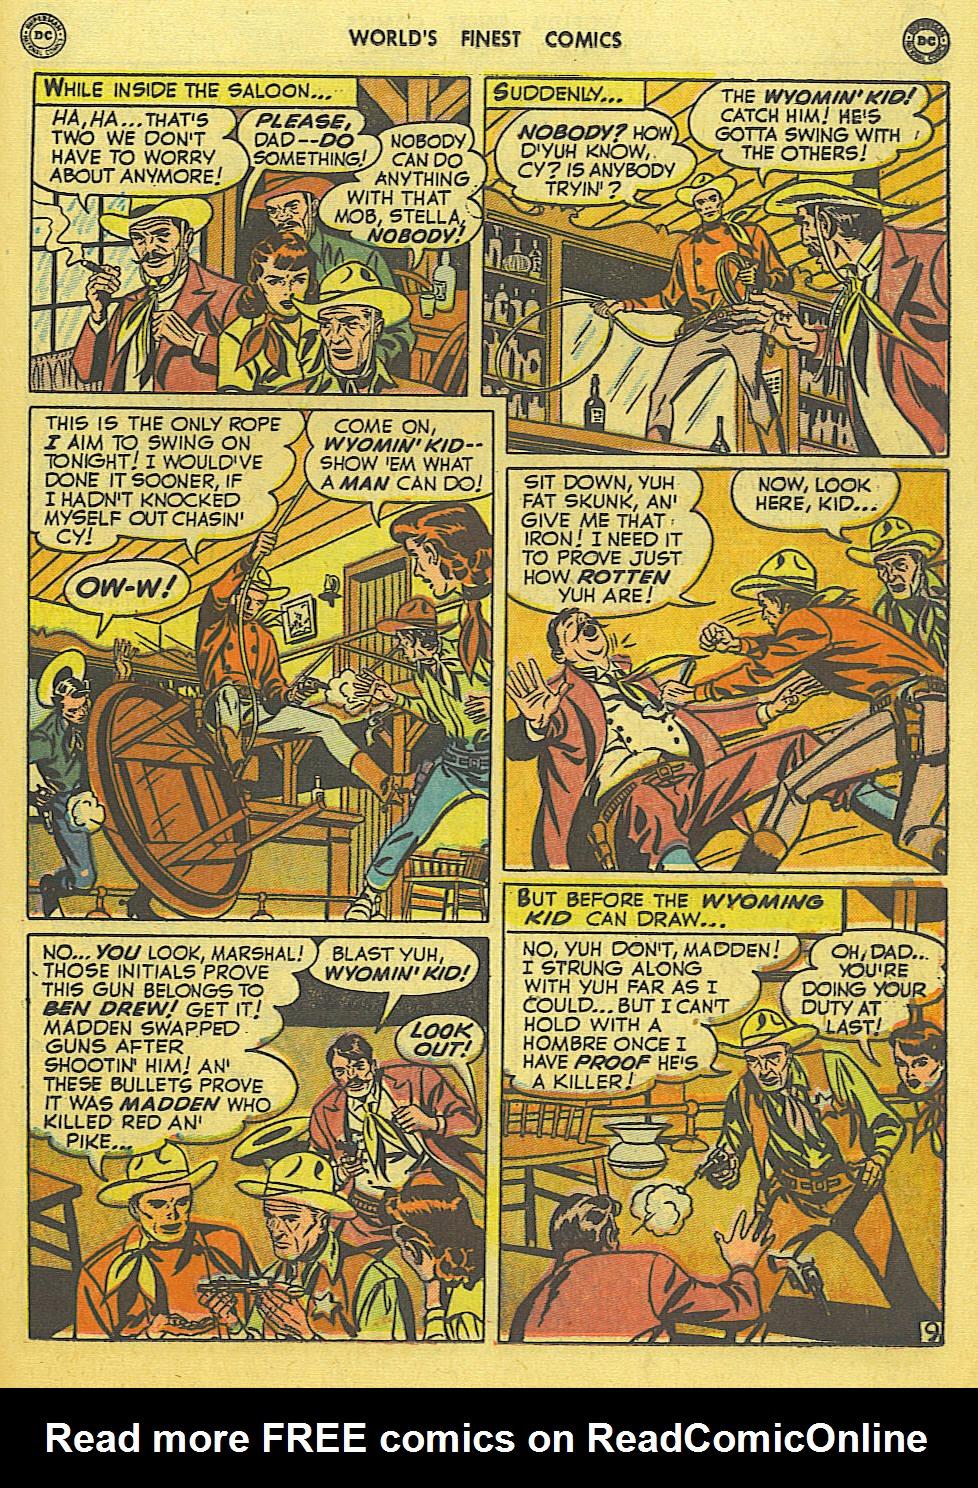 Read online World's Finest Comics comic -  Issue #49 - 48